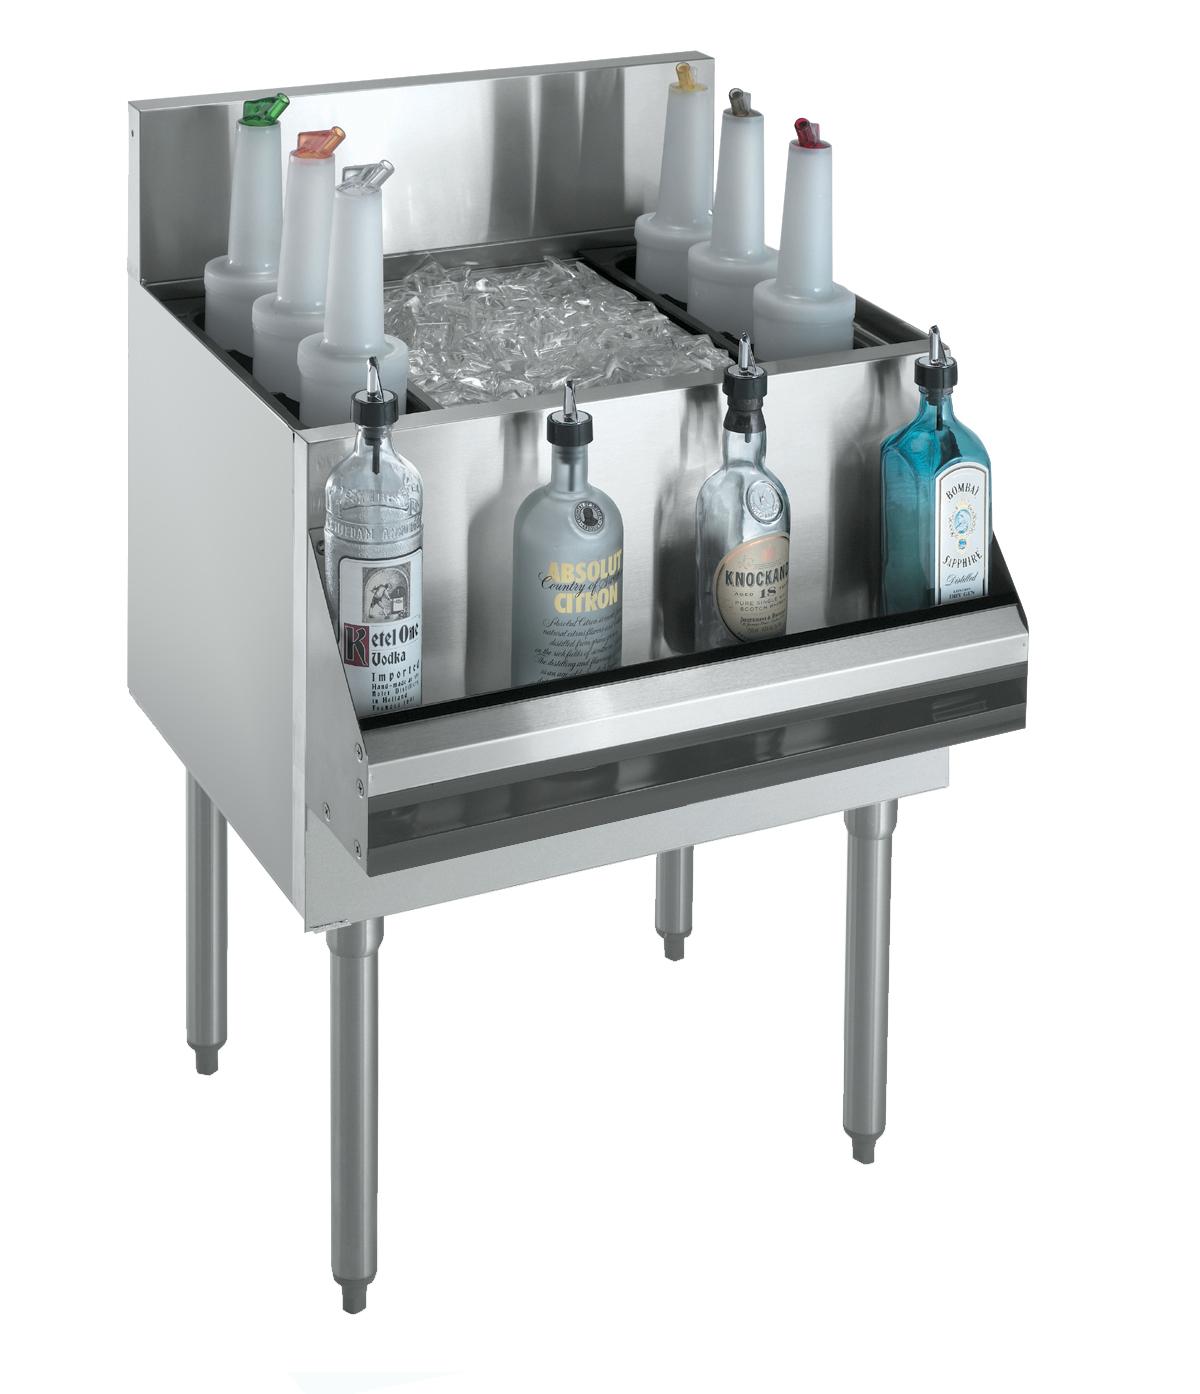 Krowne Metal KR18-42-10 underbar ice bin/cocktail unit